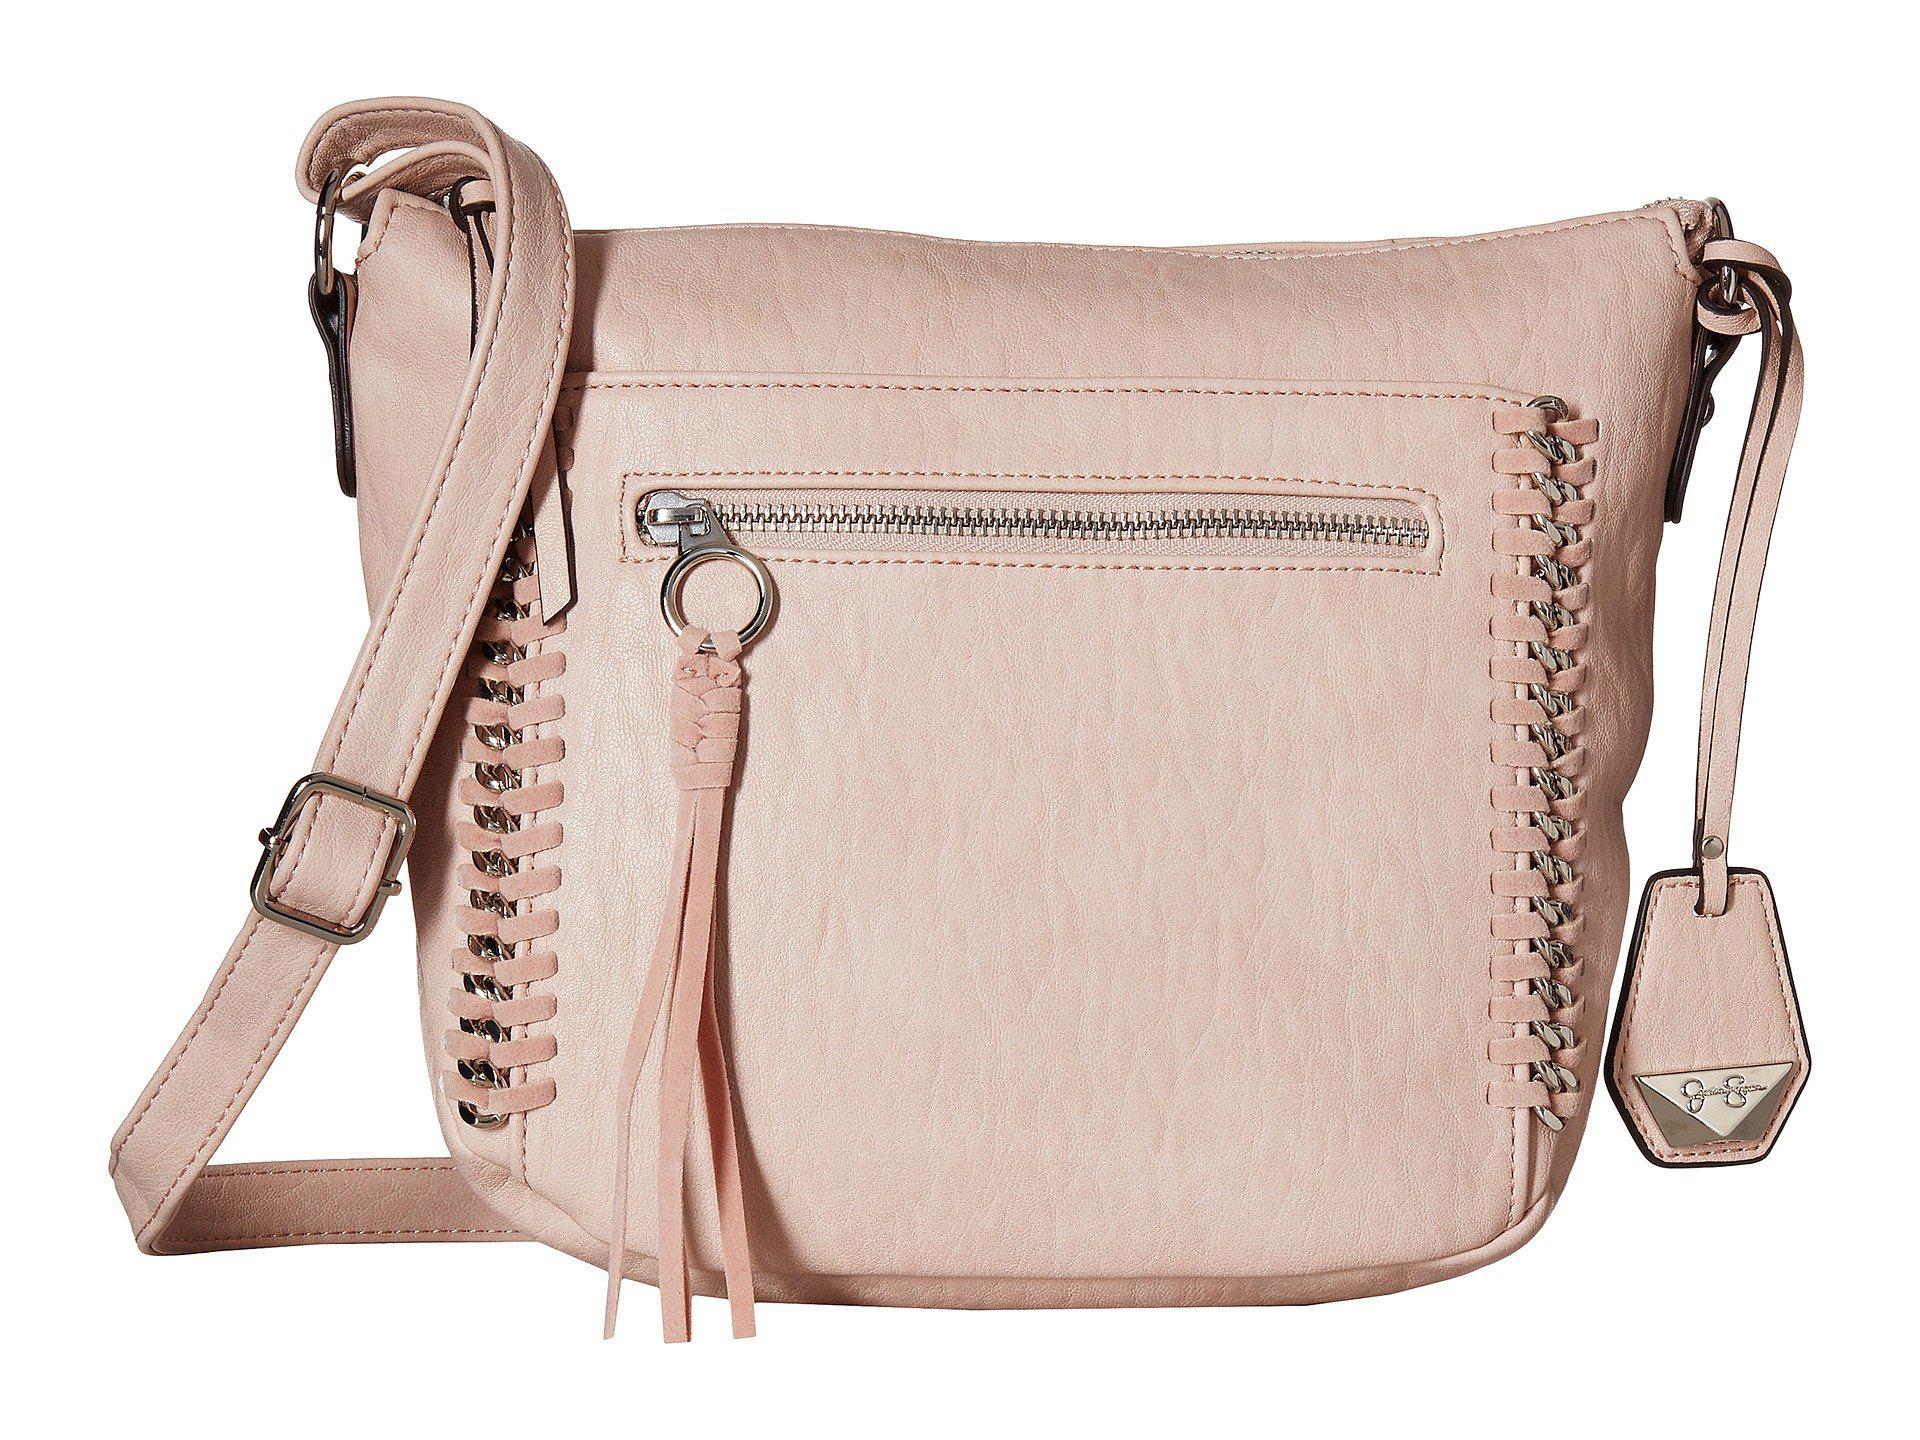 Jessica Simpson Becca Bucket Crossbody (Platinum) Cross Body Handbags O9lJ2hM9g